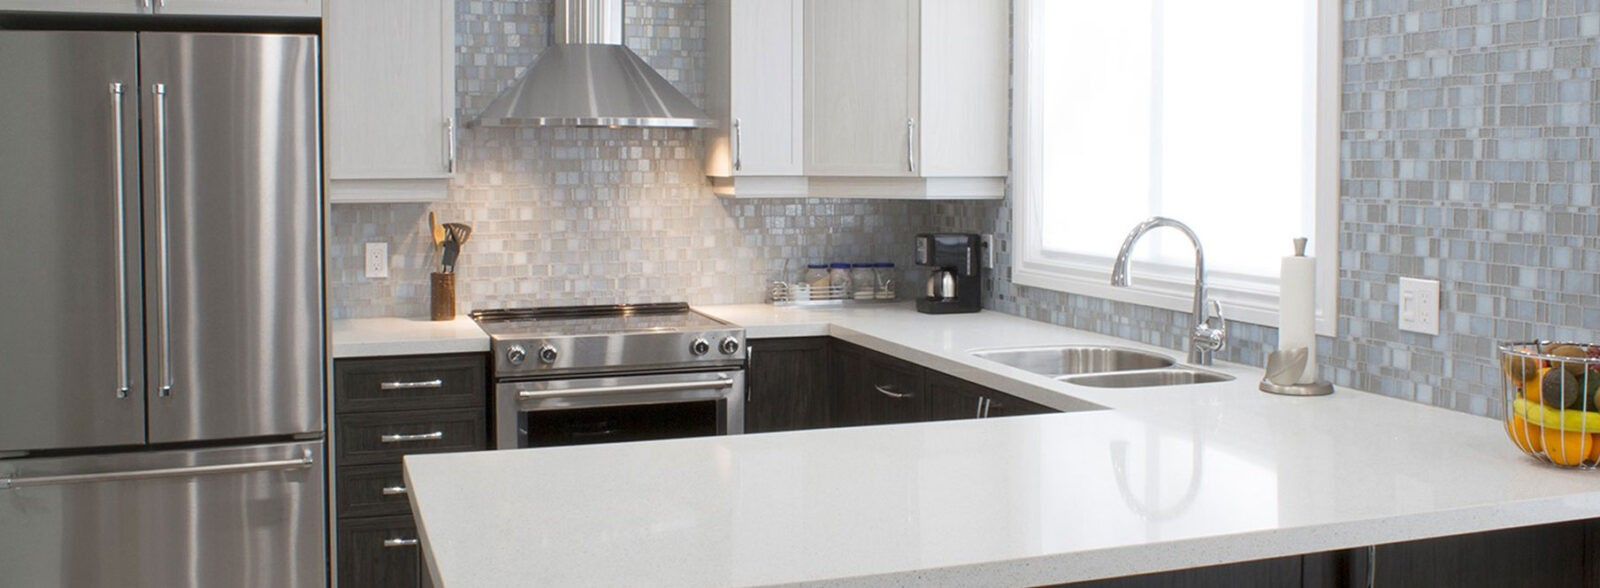 Montgomery Bathroom Kitchen Remodeling Granite Countertops